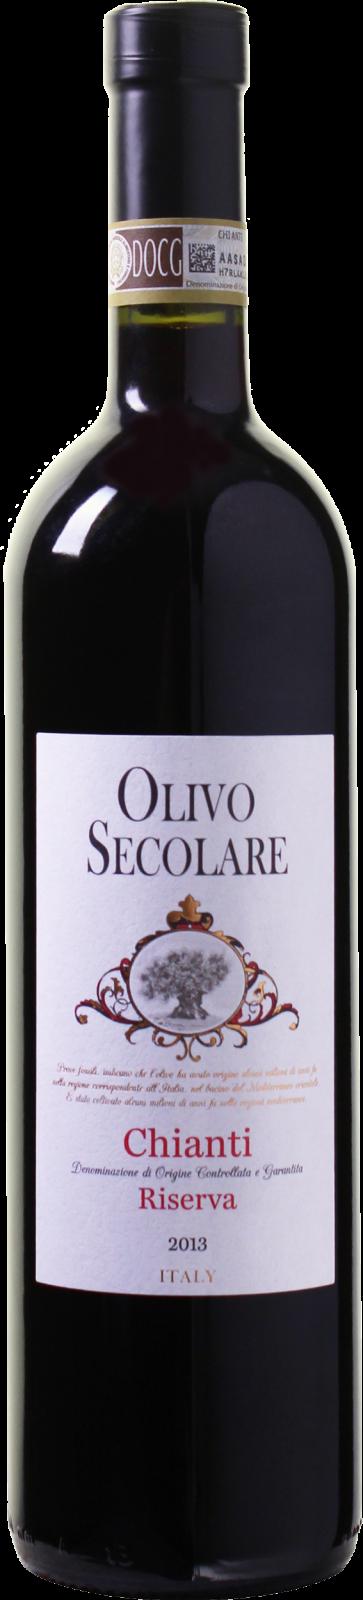 Bonacchi 'Olivo Secolare' Chianti Riserva wijnbeurs.nl